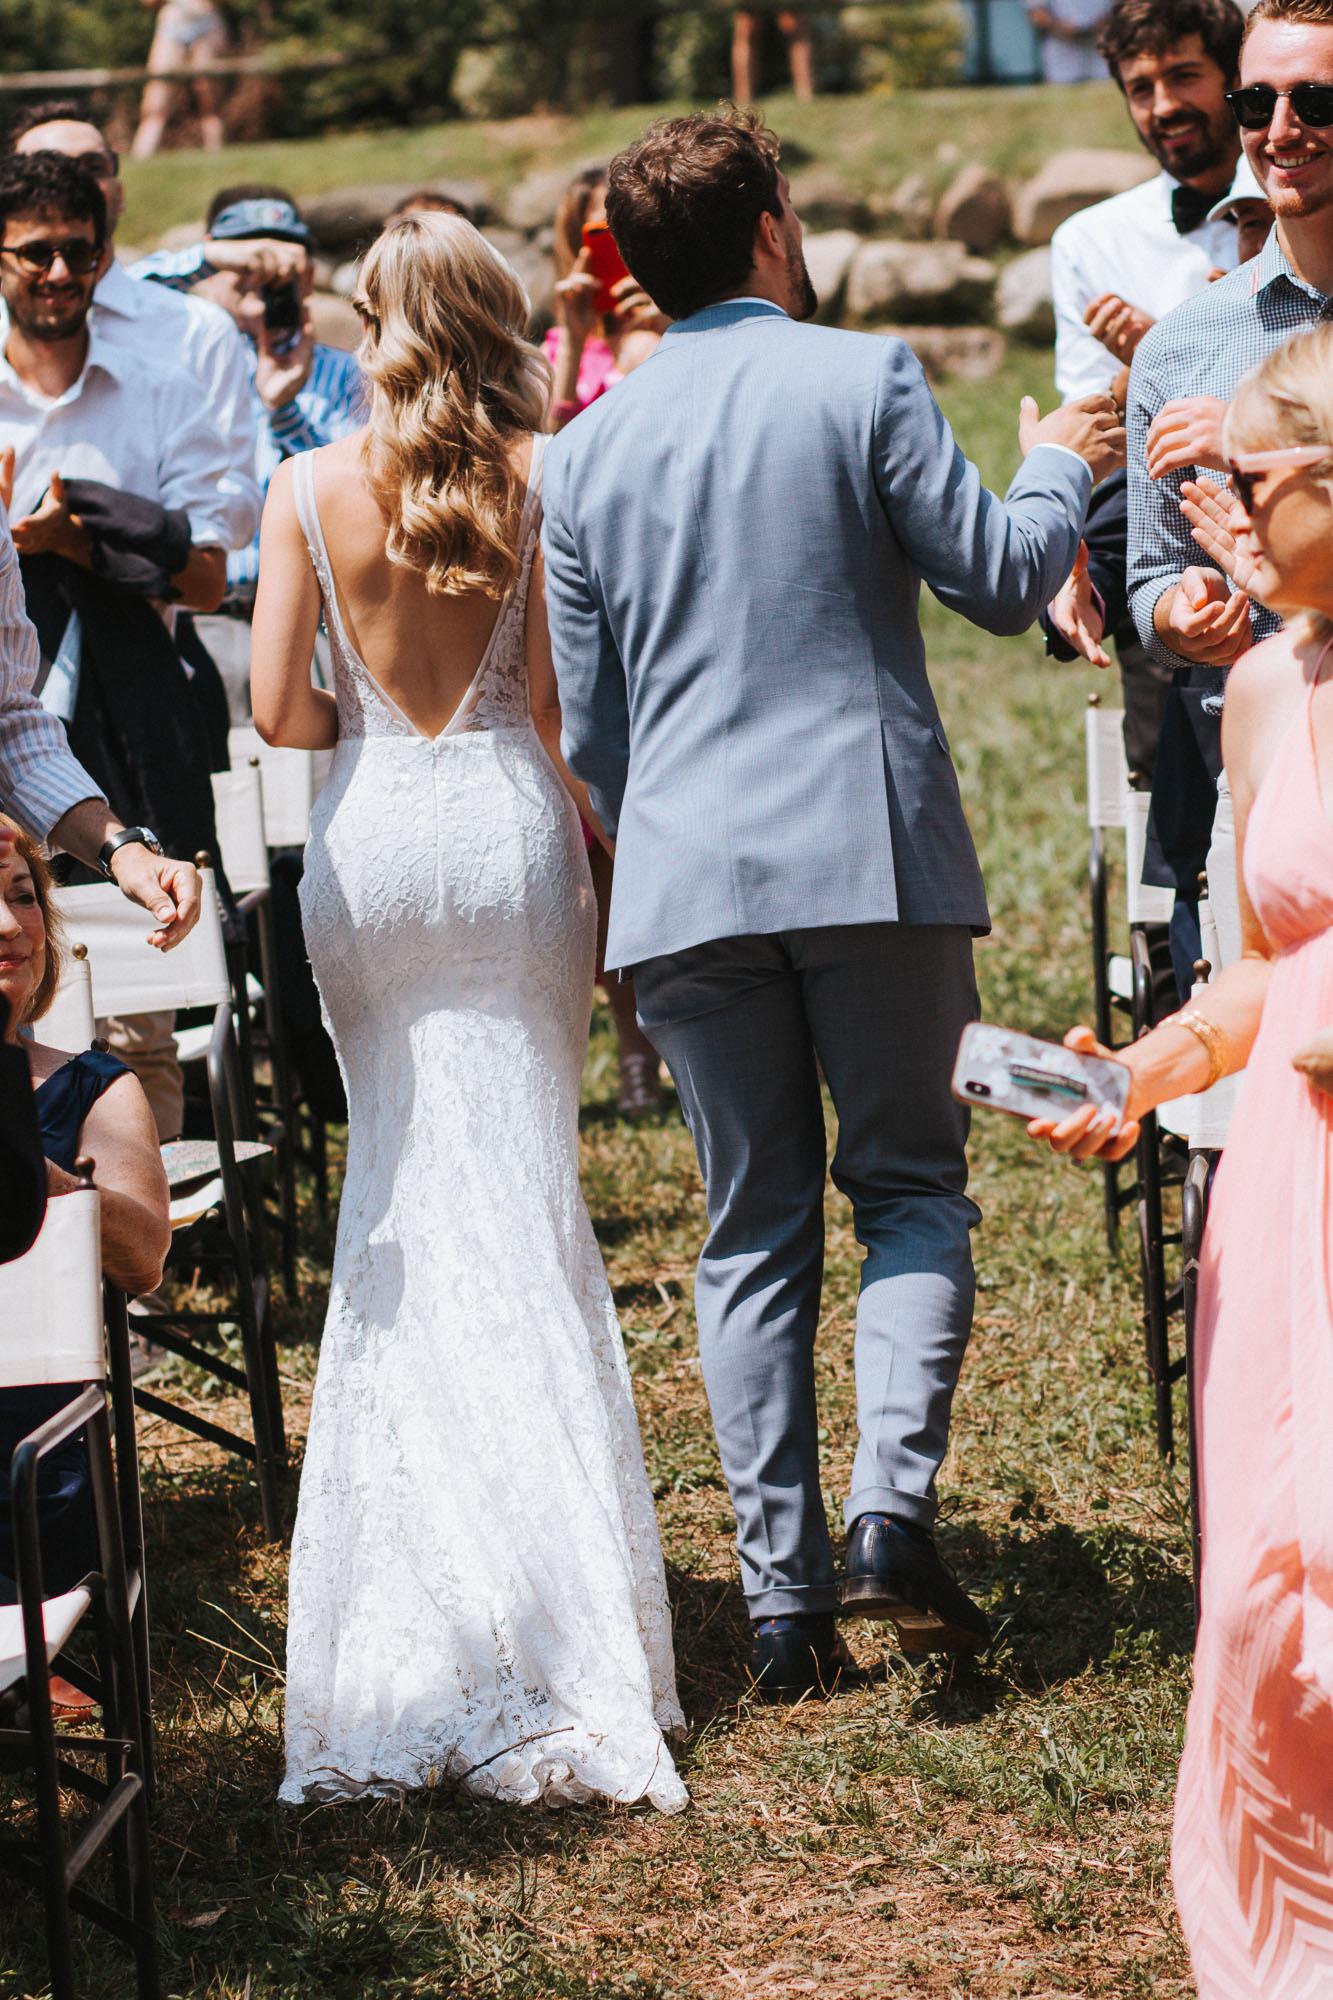 20180720-Memoryfactory-Sara&Jacopo-53- Hochzeit.jpg